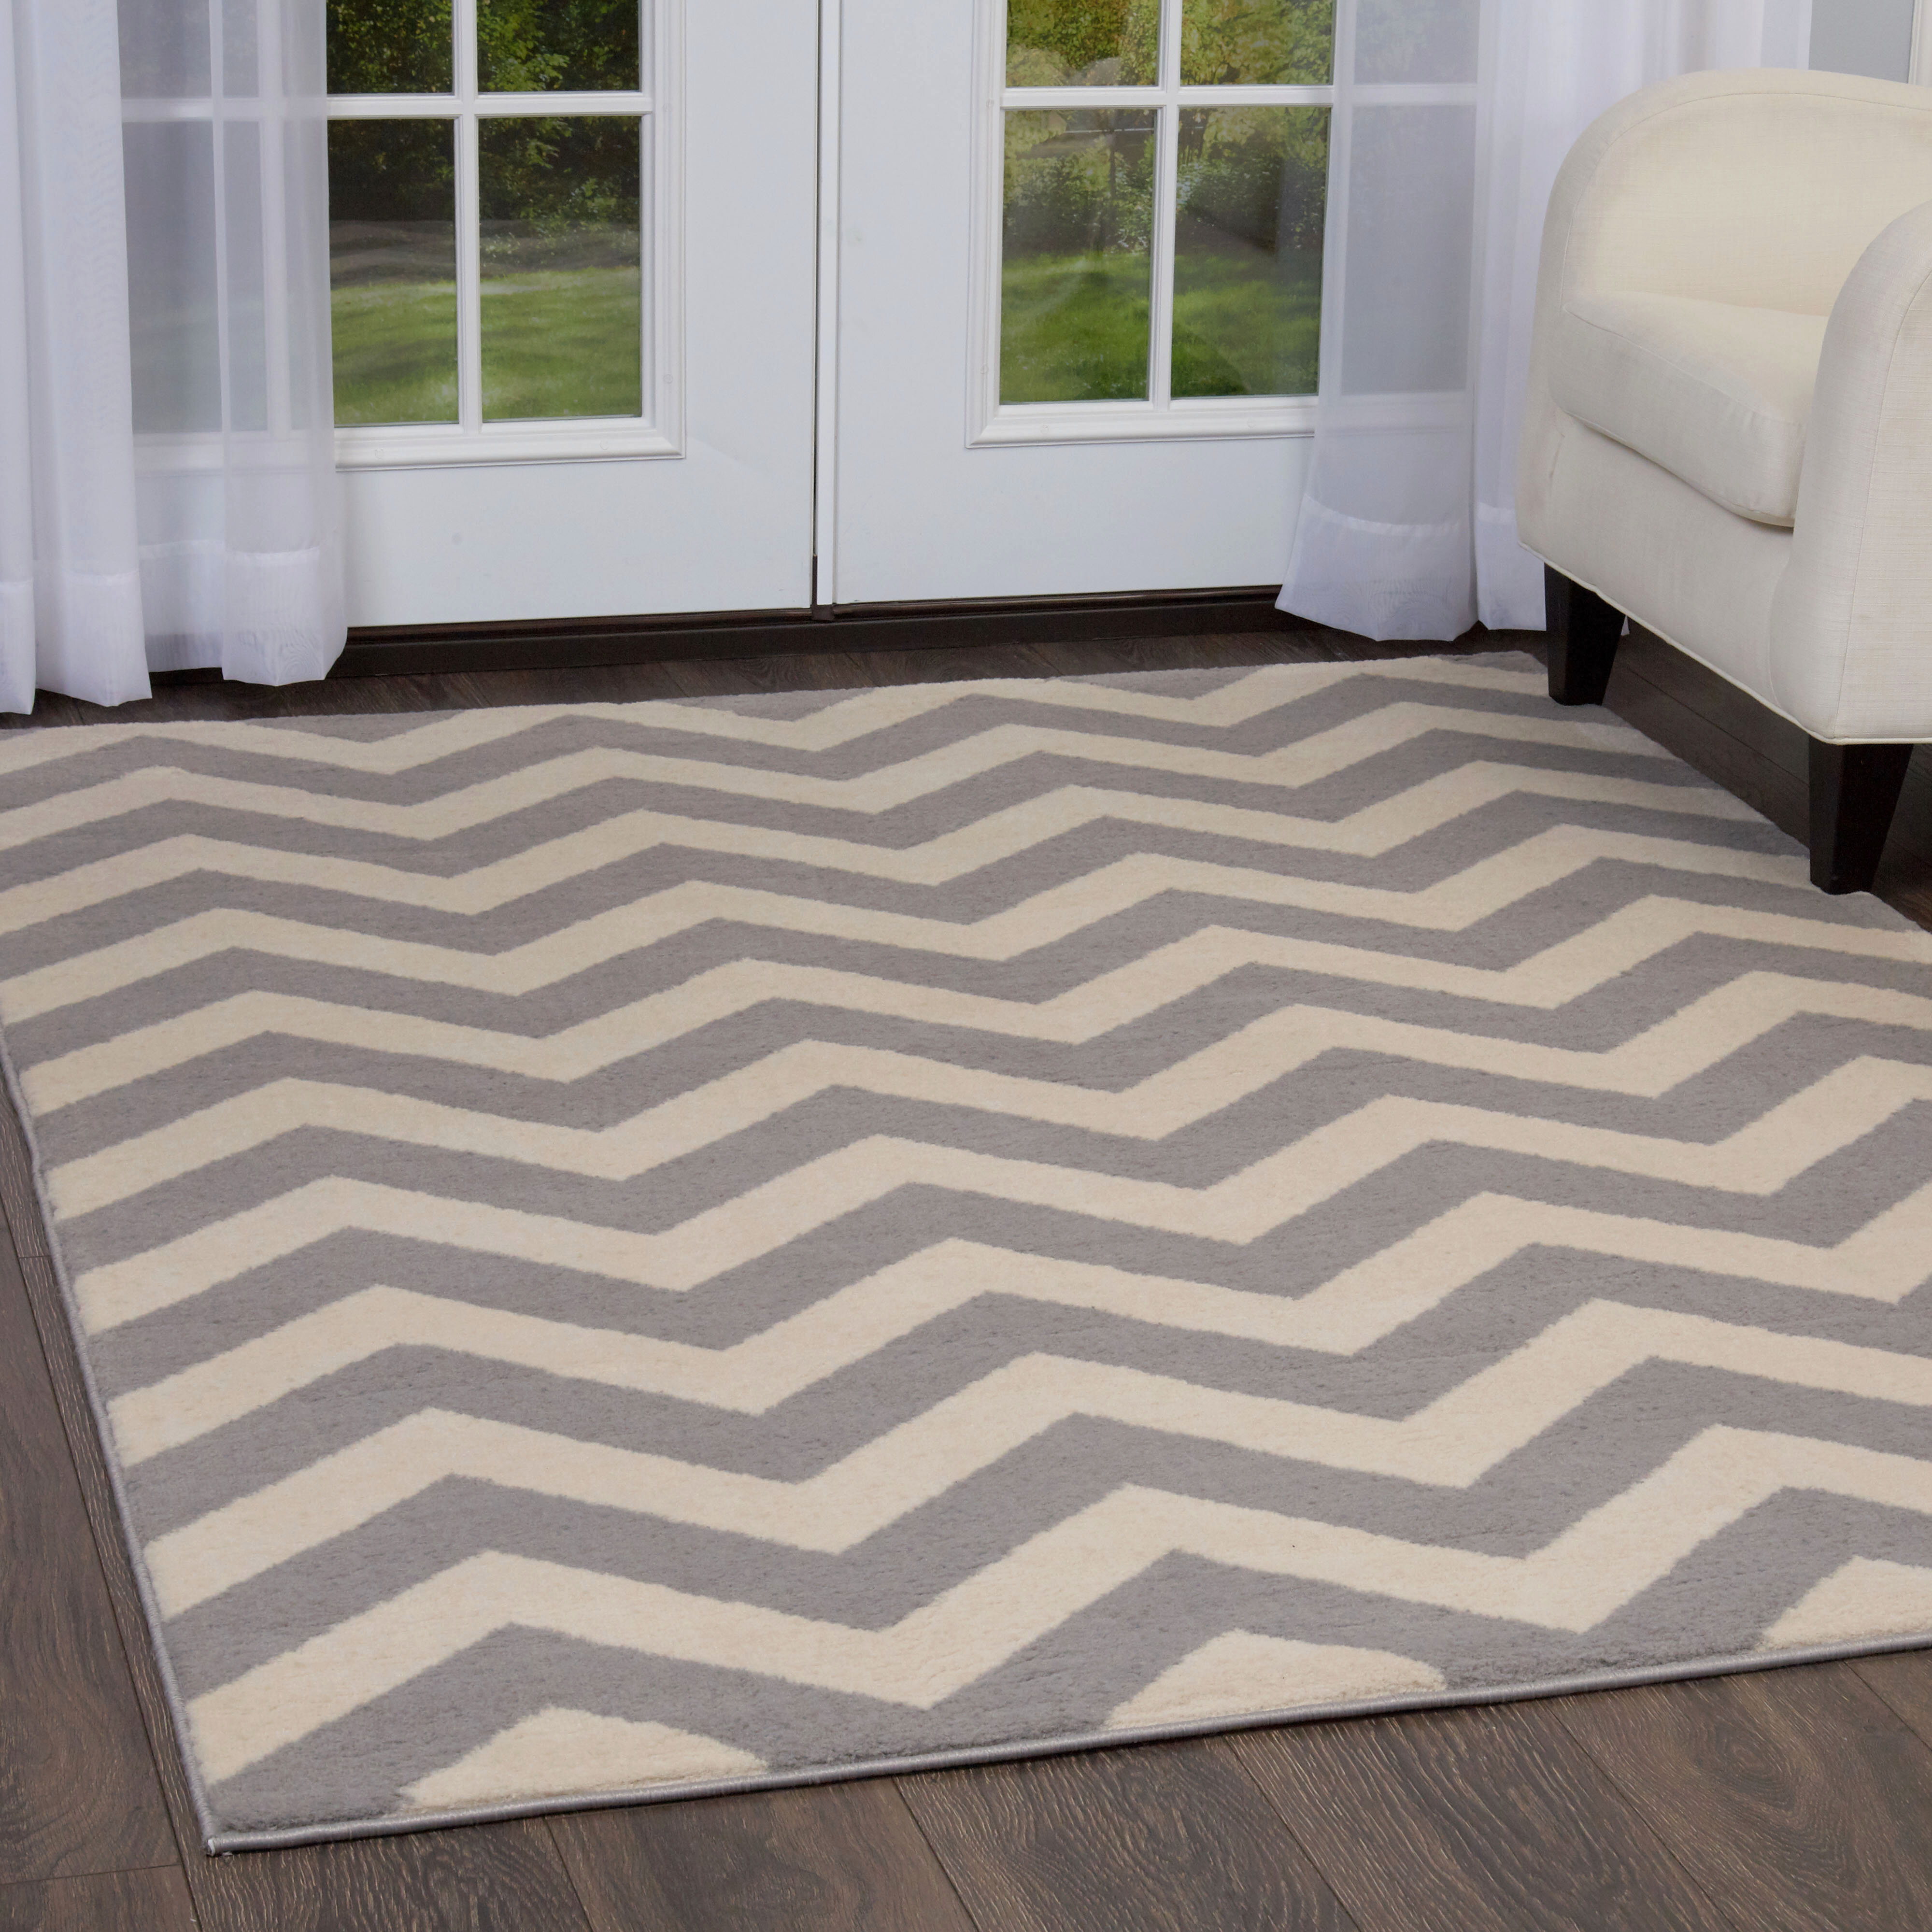 titanicinternational rugs area rug kohls org dorm cheap